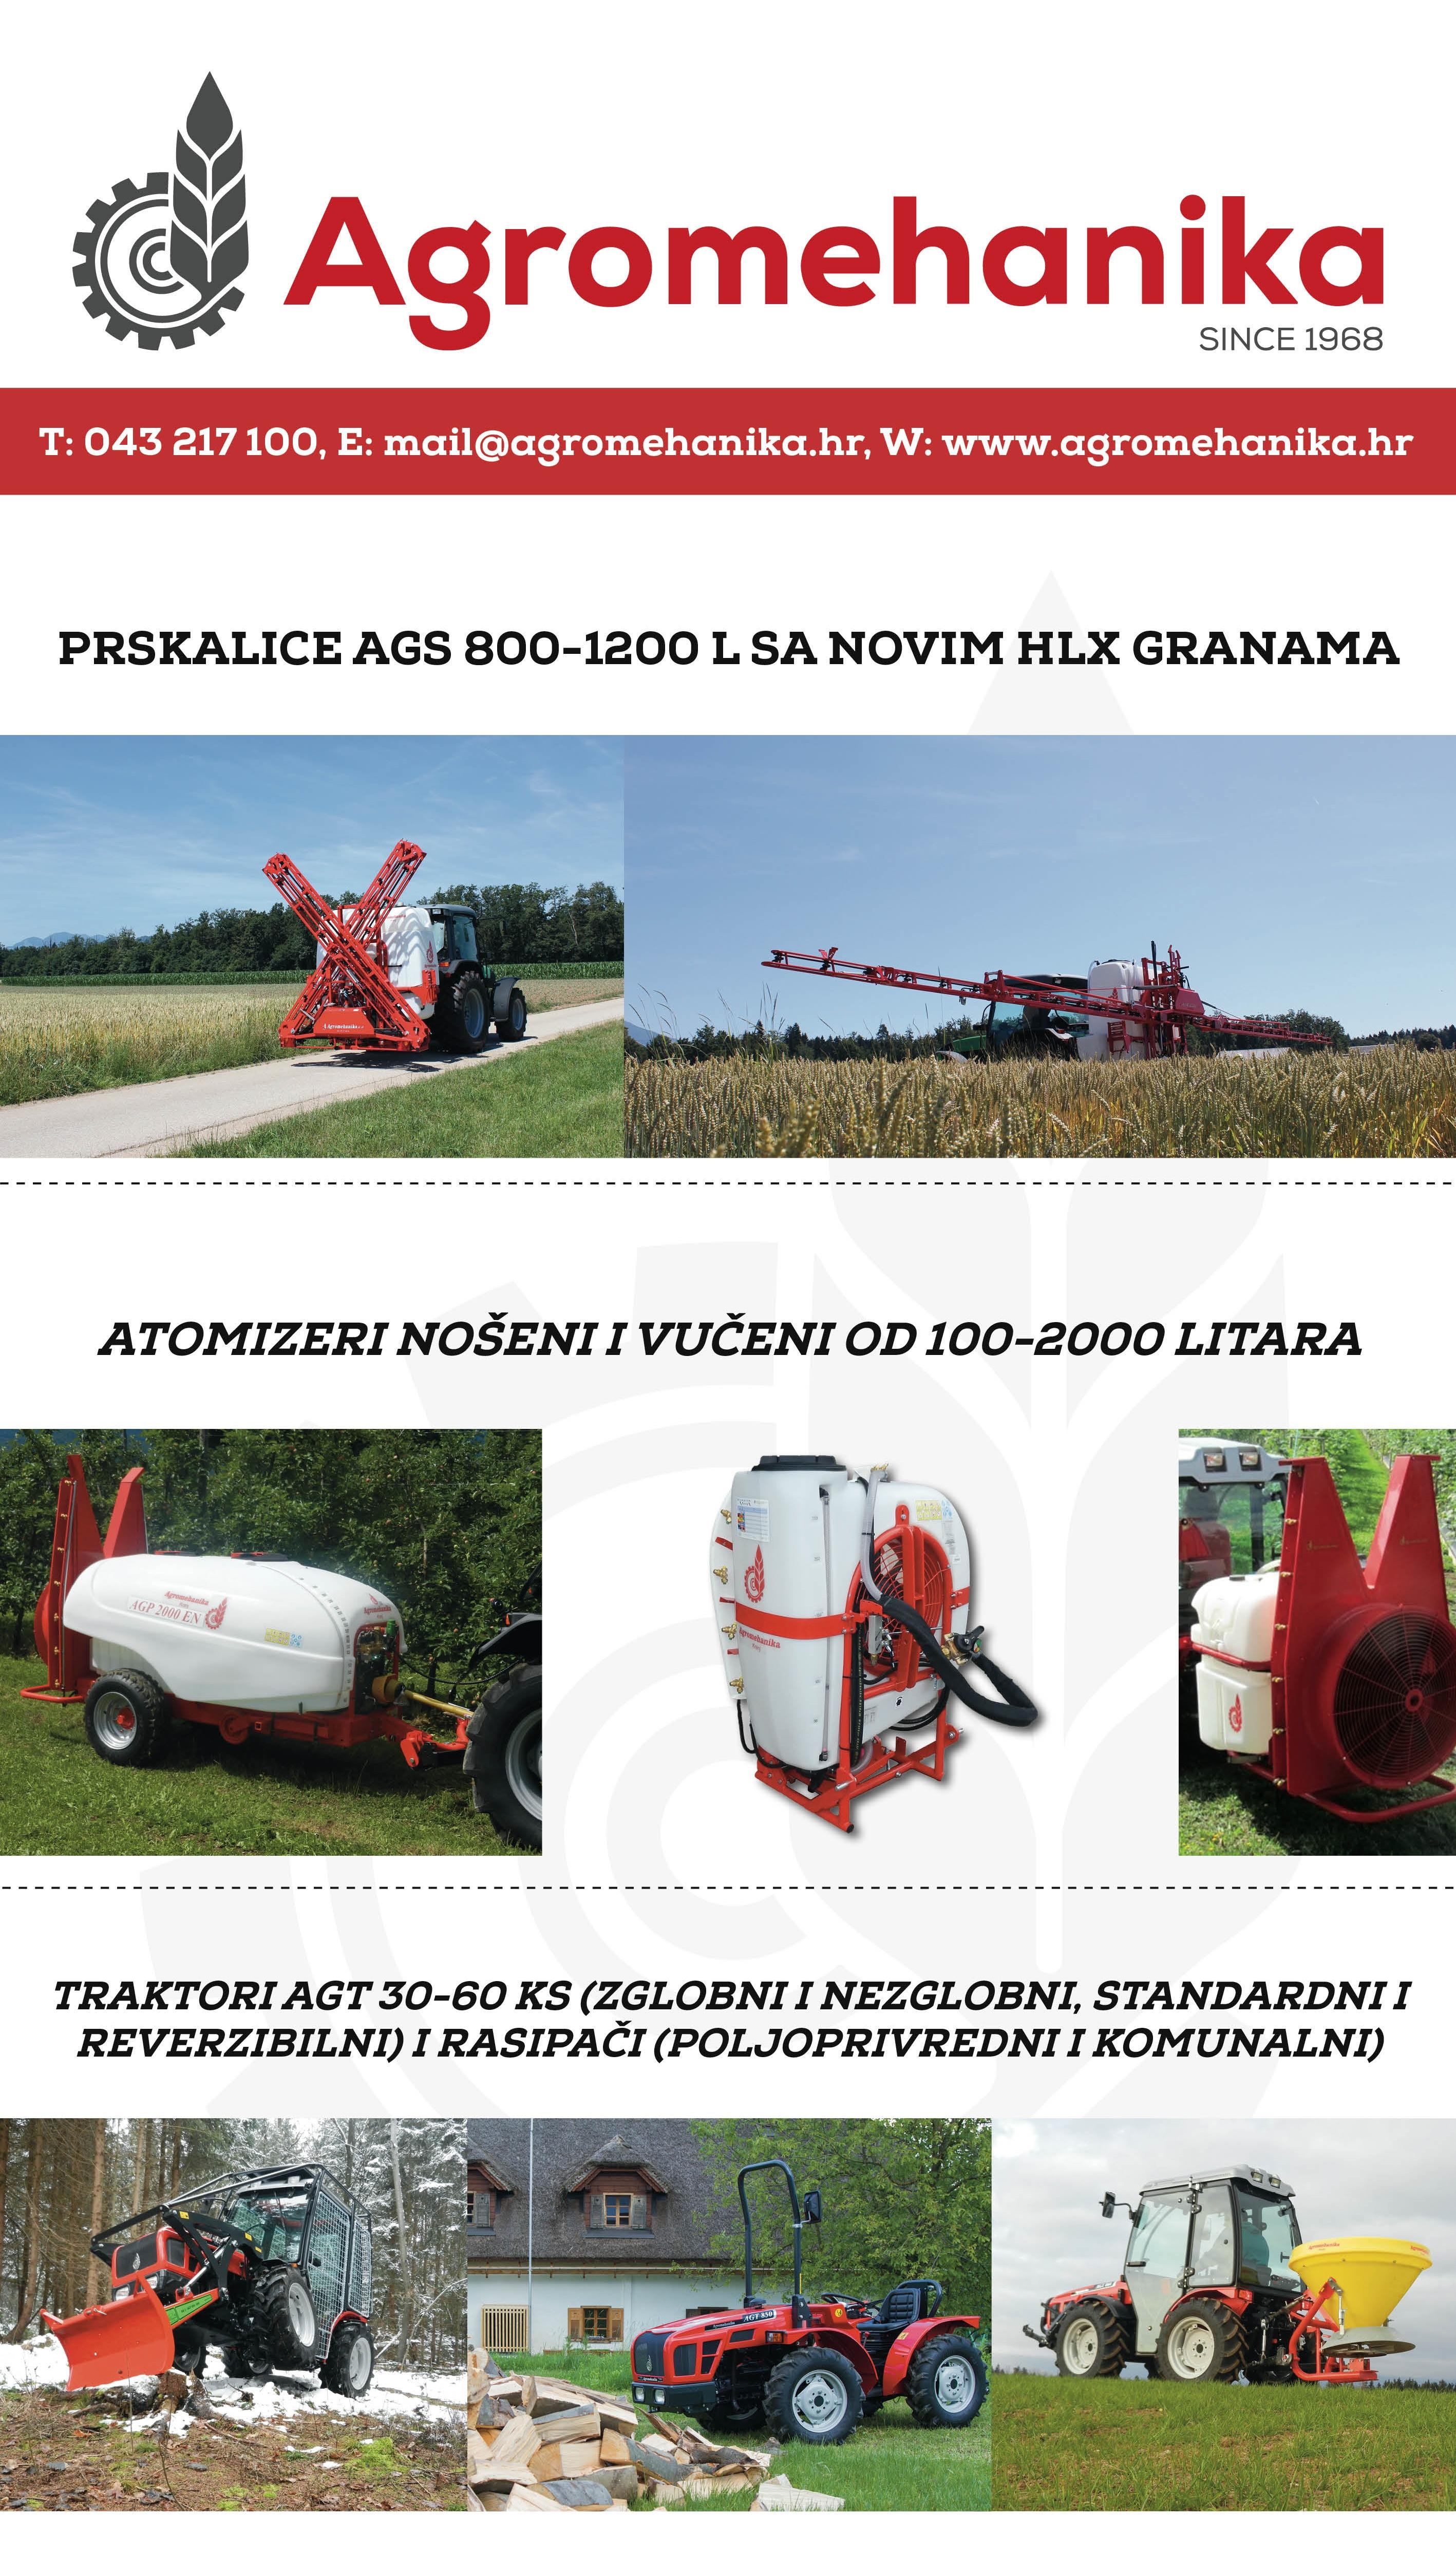 Prskalice, dodatna oprema i traktori